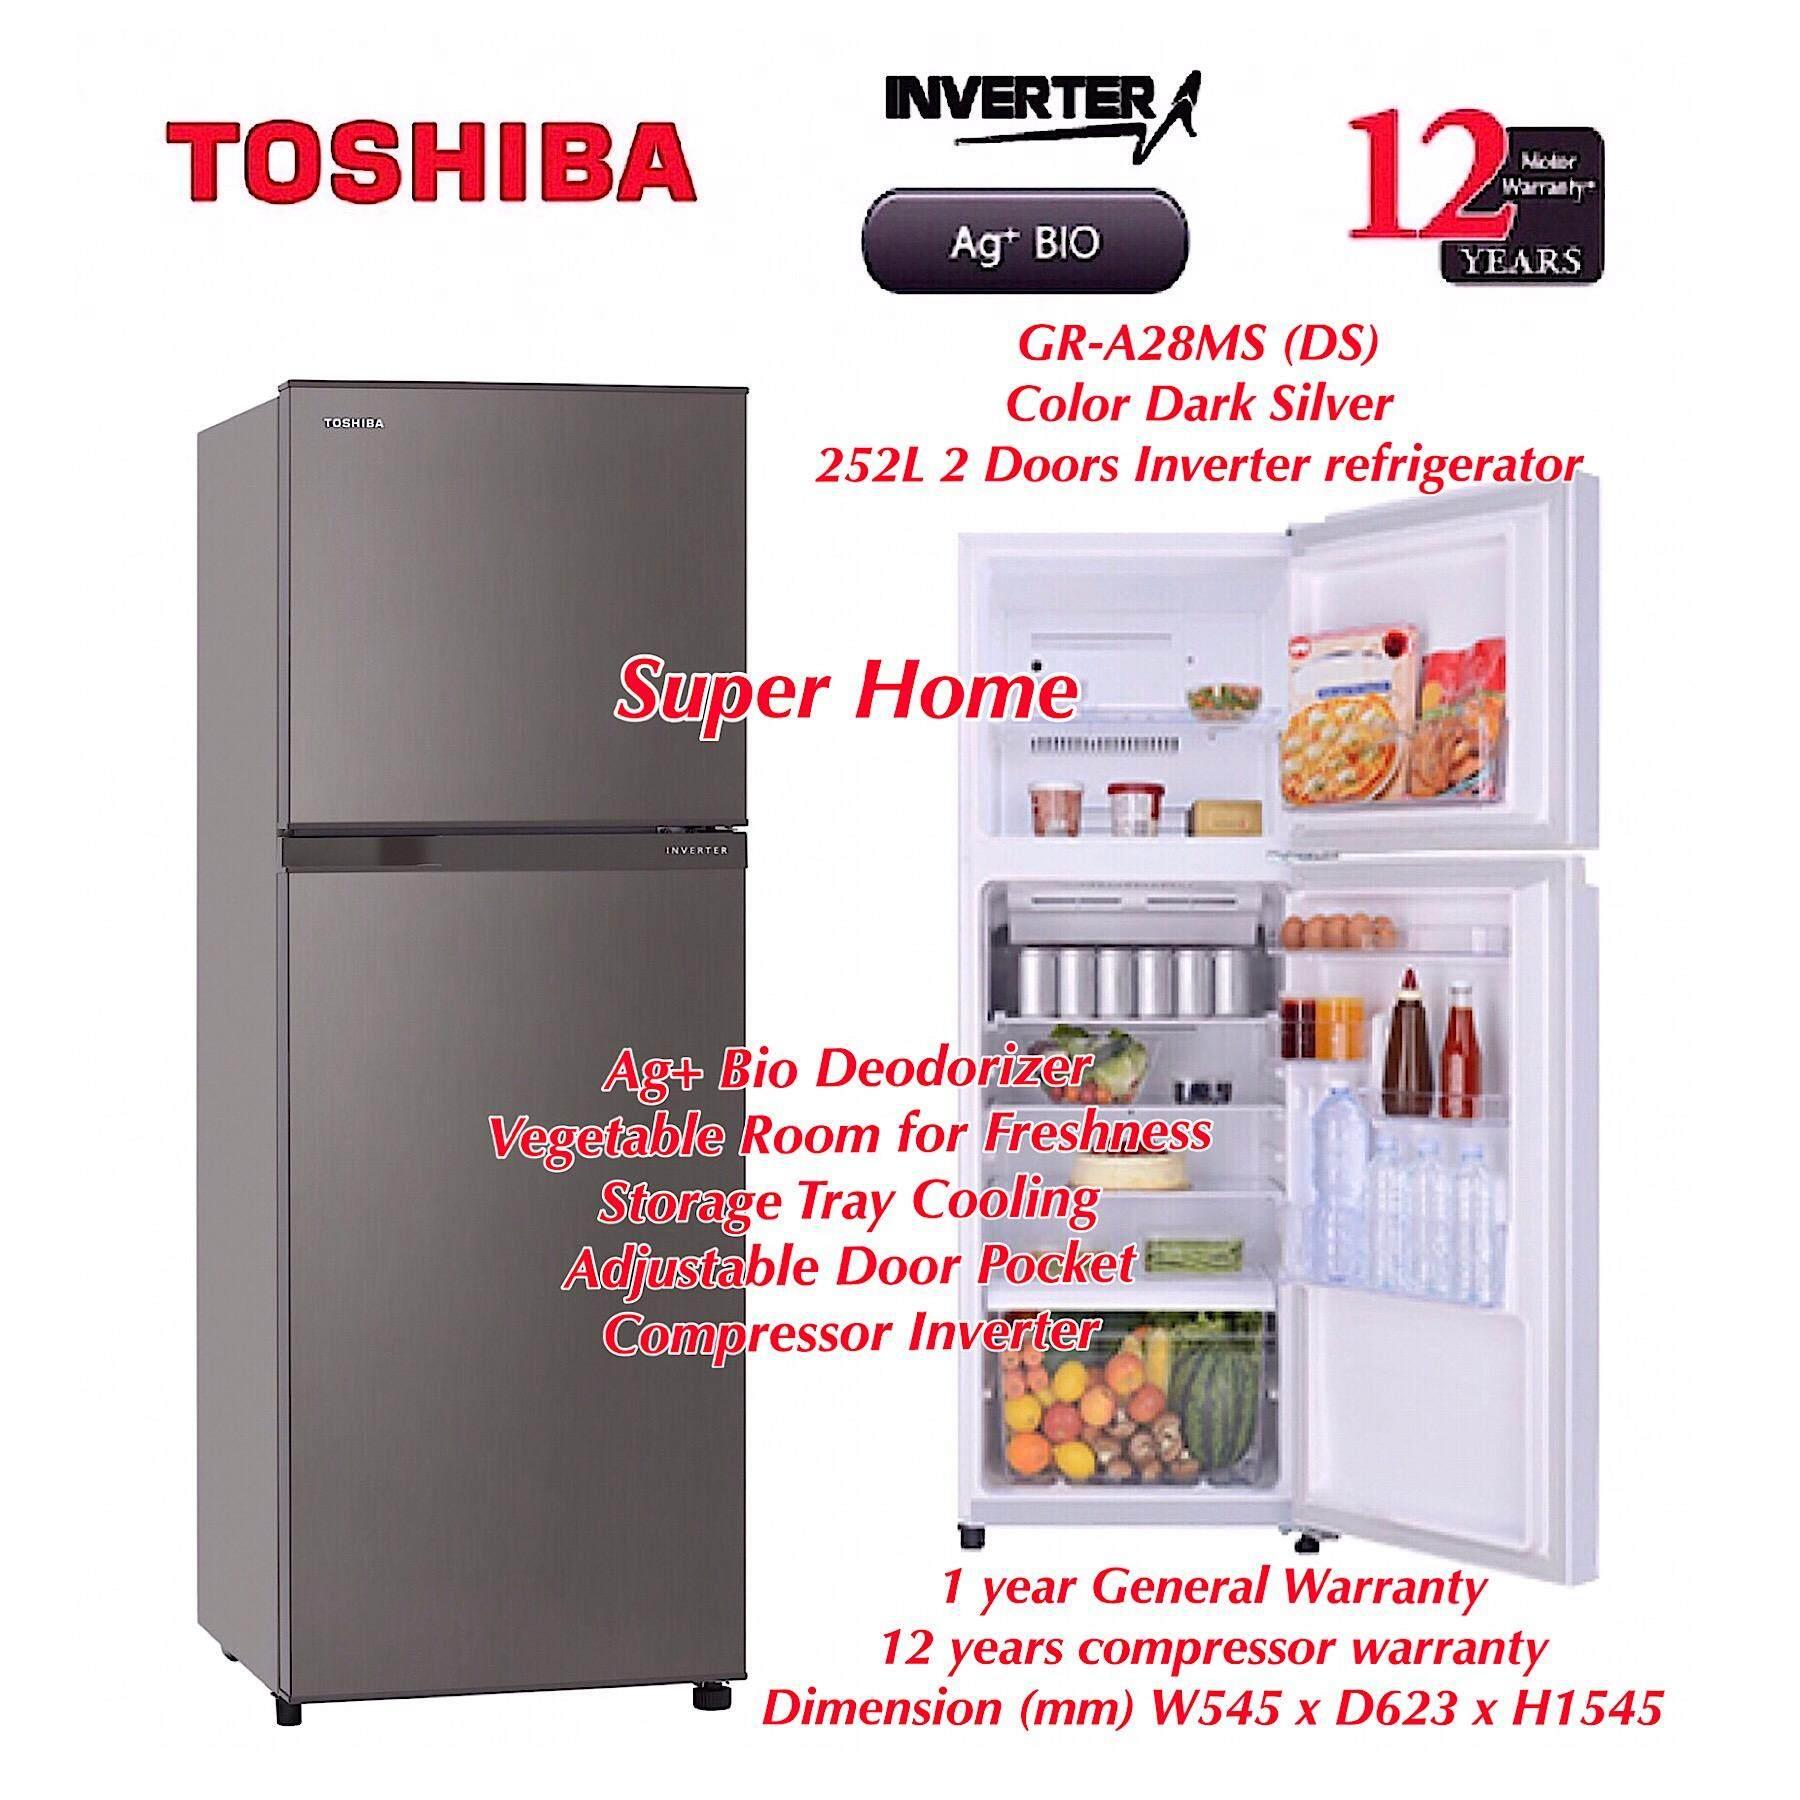 Toshiba 2 Doors Inverter Fridge Refrigerator GR-A28MS (DS) Dark Silver - 252L - Ag+ Bio Deodorizer